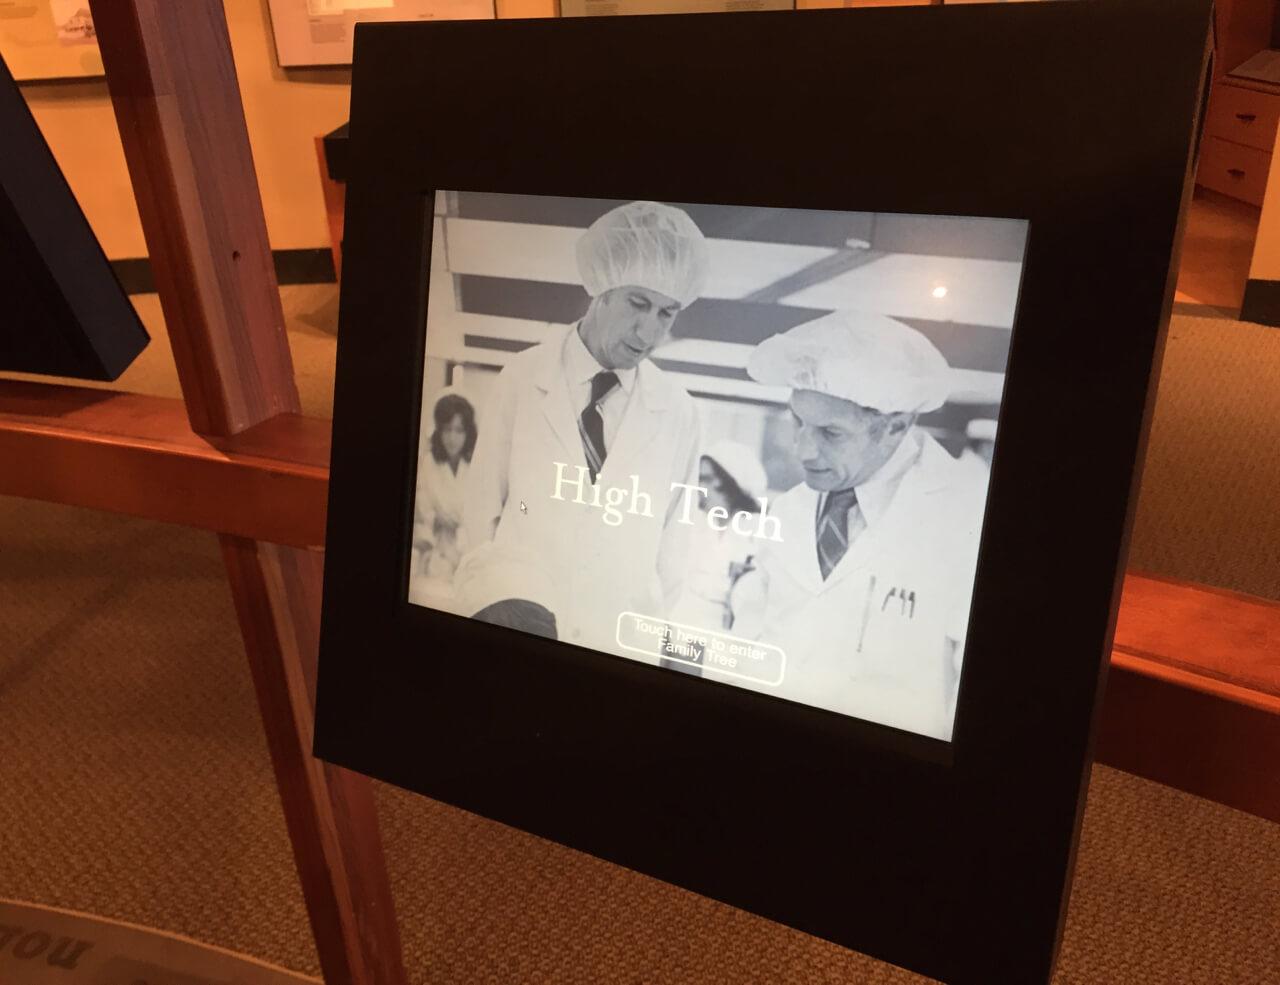 14-Los-Altos-History-Museum-The Sibbett Group-Interactive Media.jpg